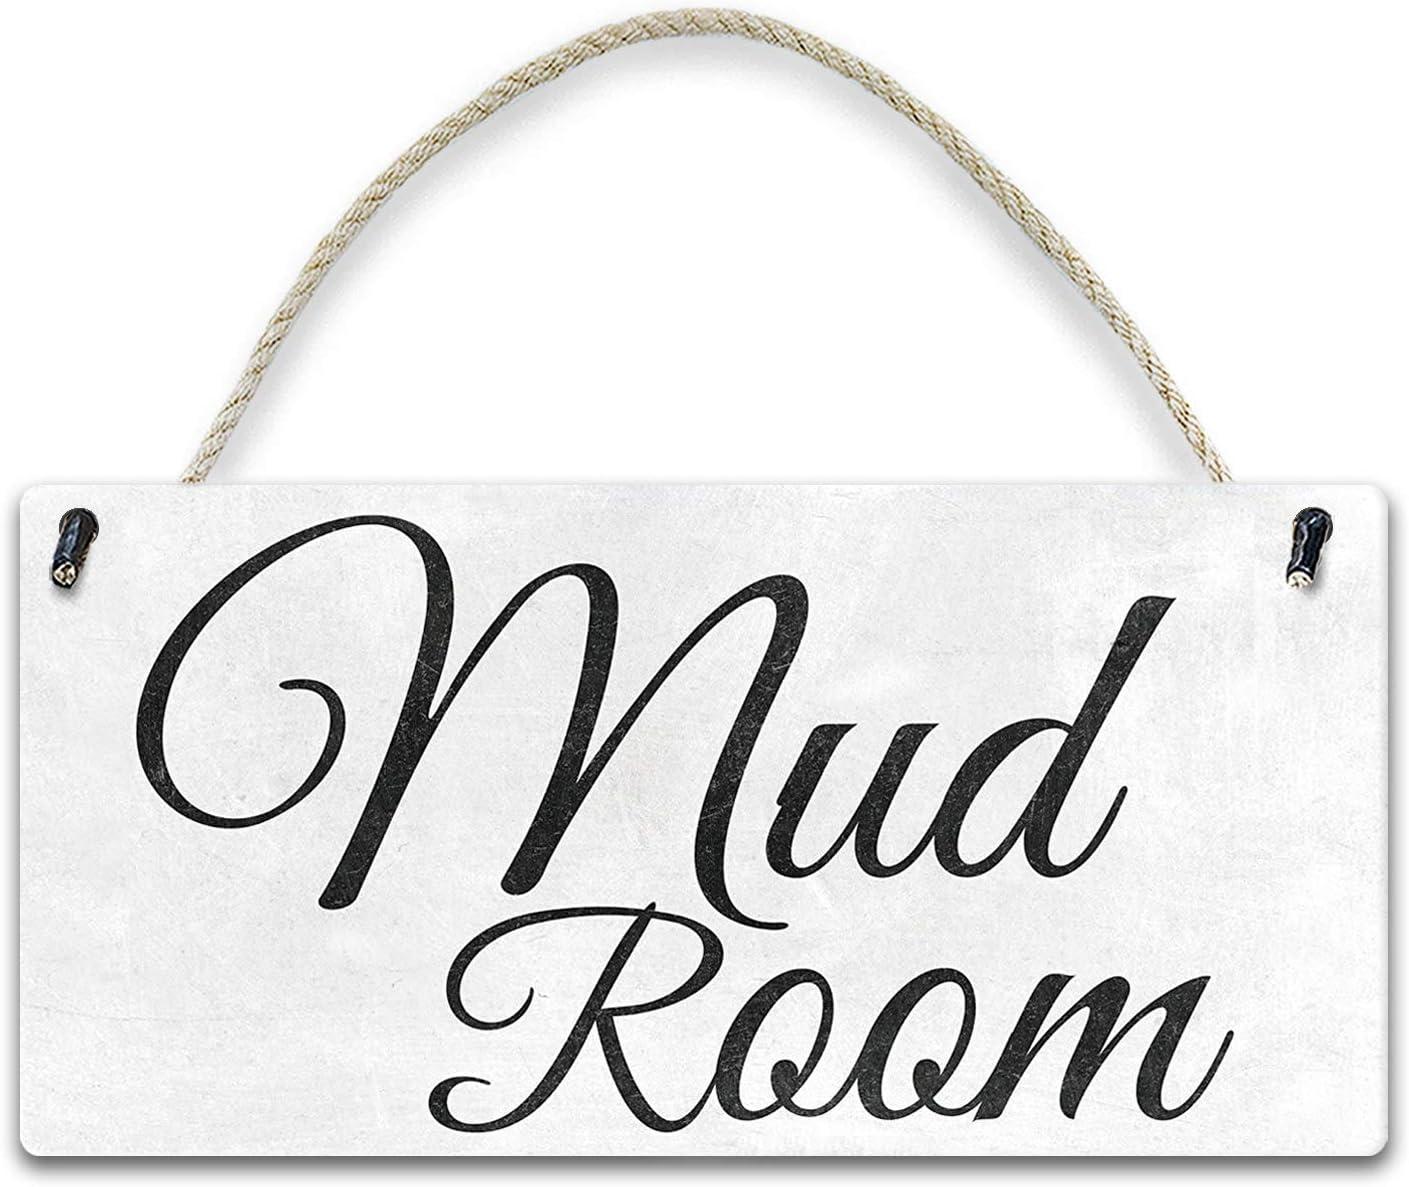 YILMEN Wooden Sign Mud Room for Mud Room 12